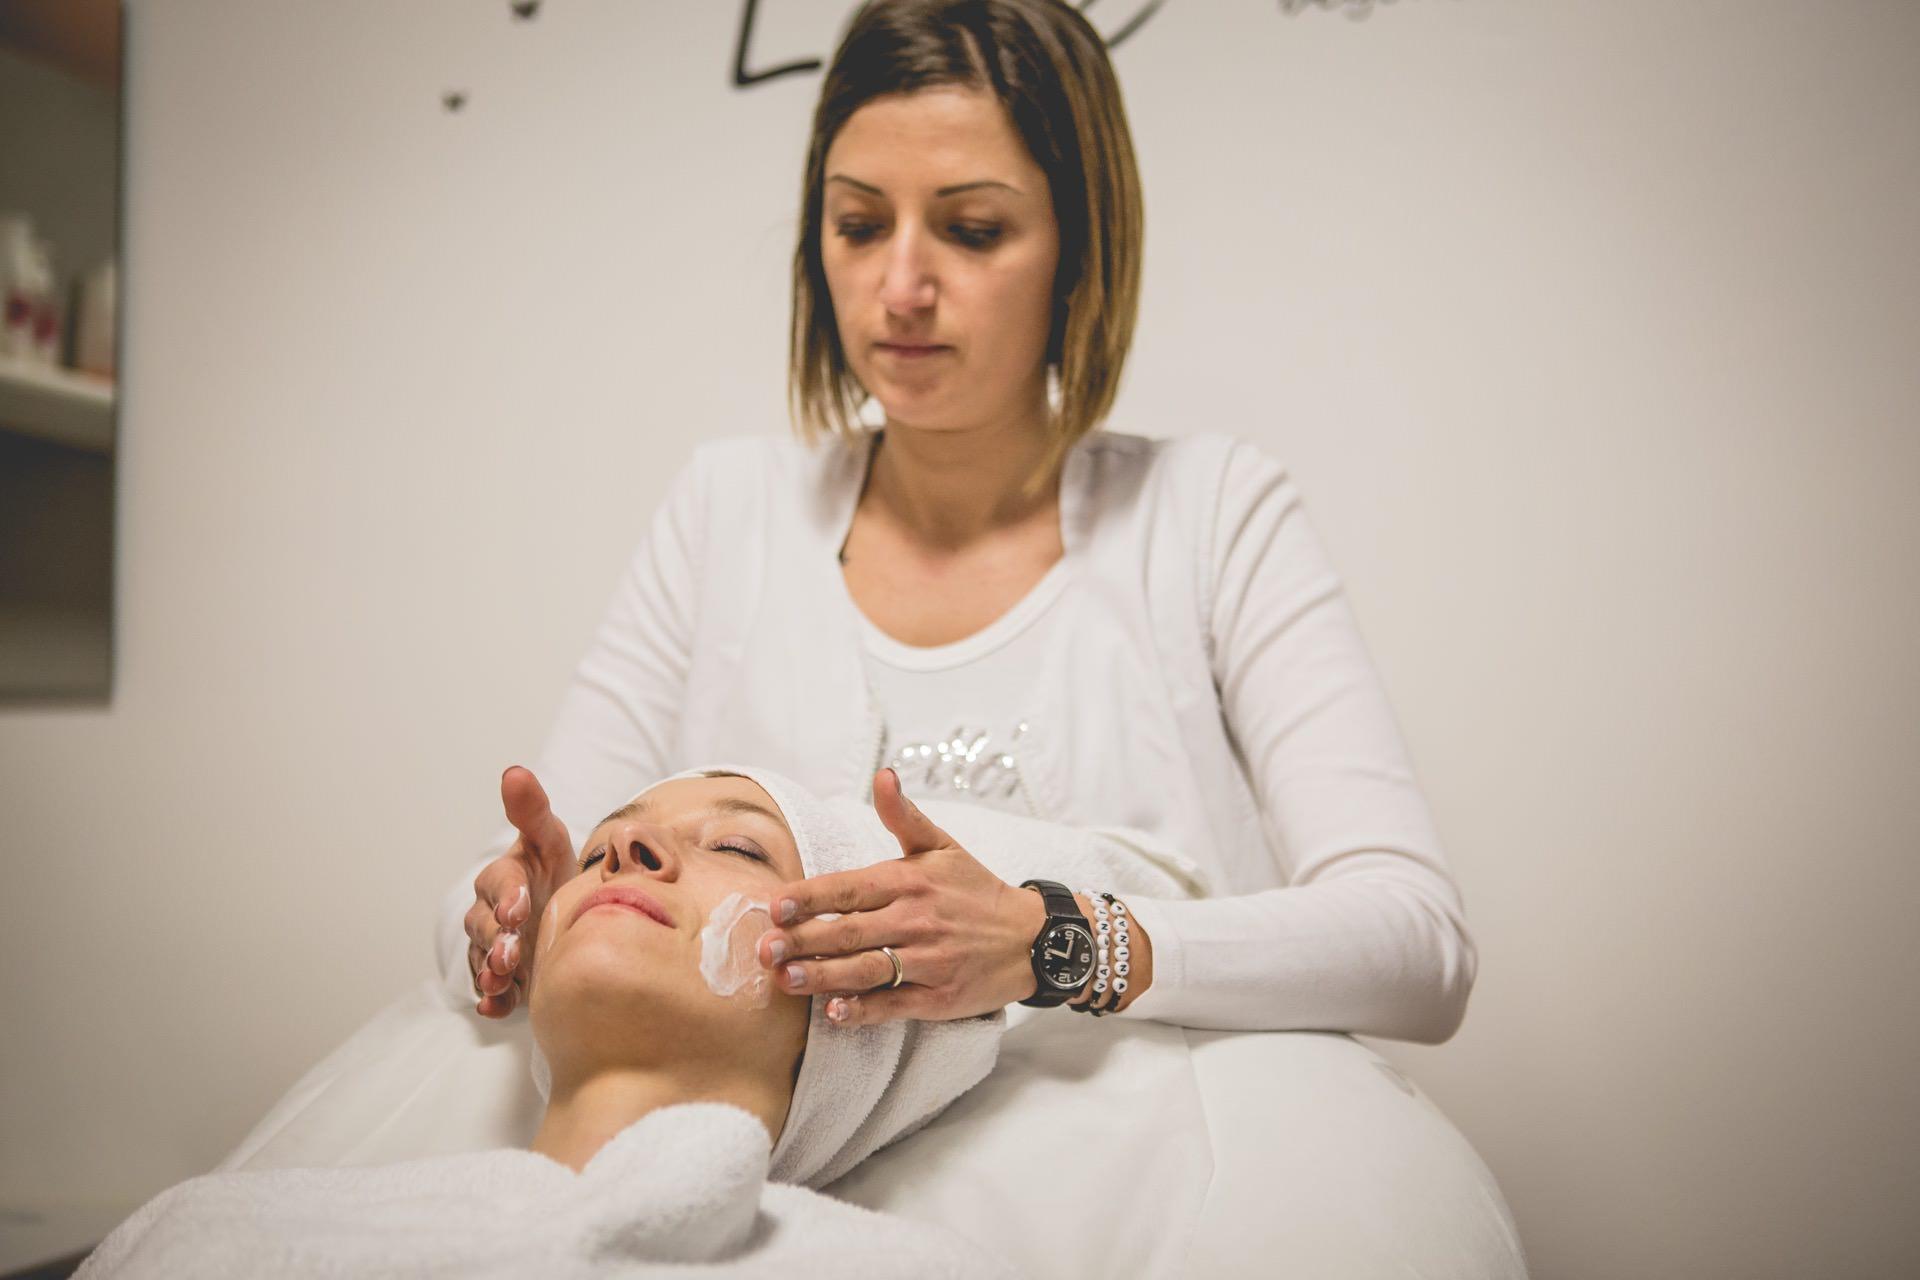 Centro Benessere Debora peeling viso